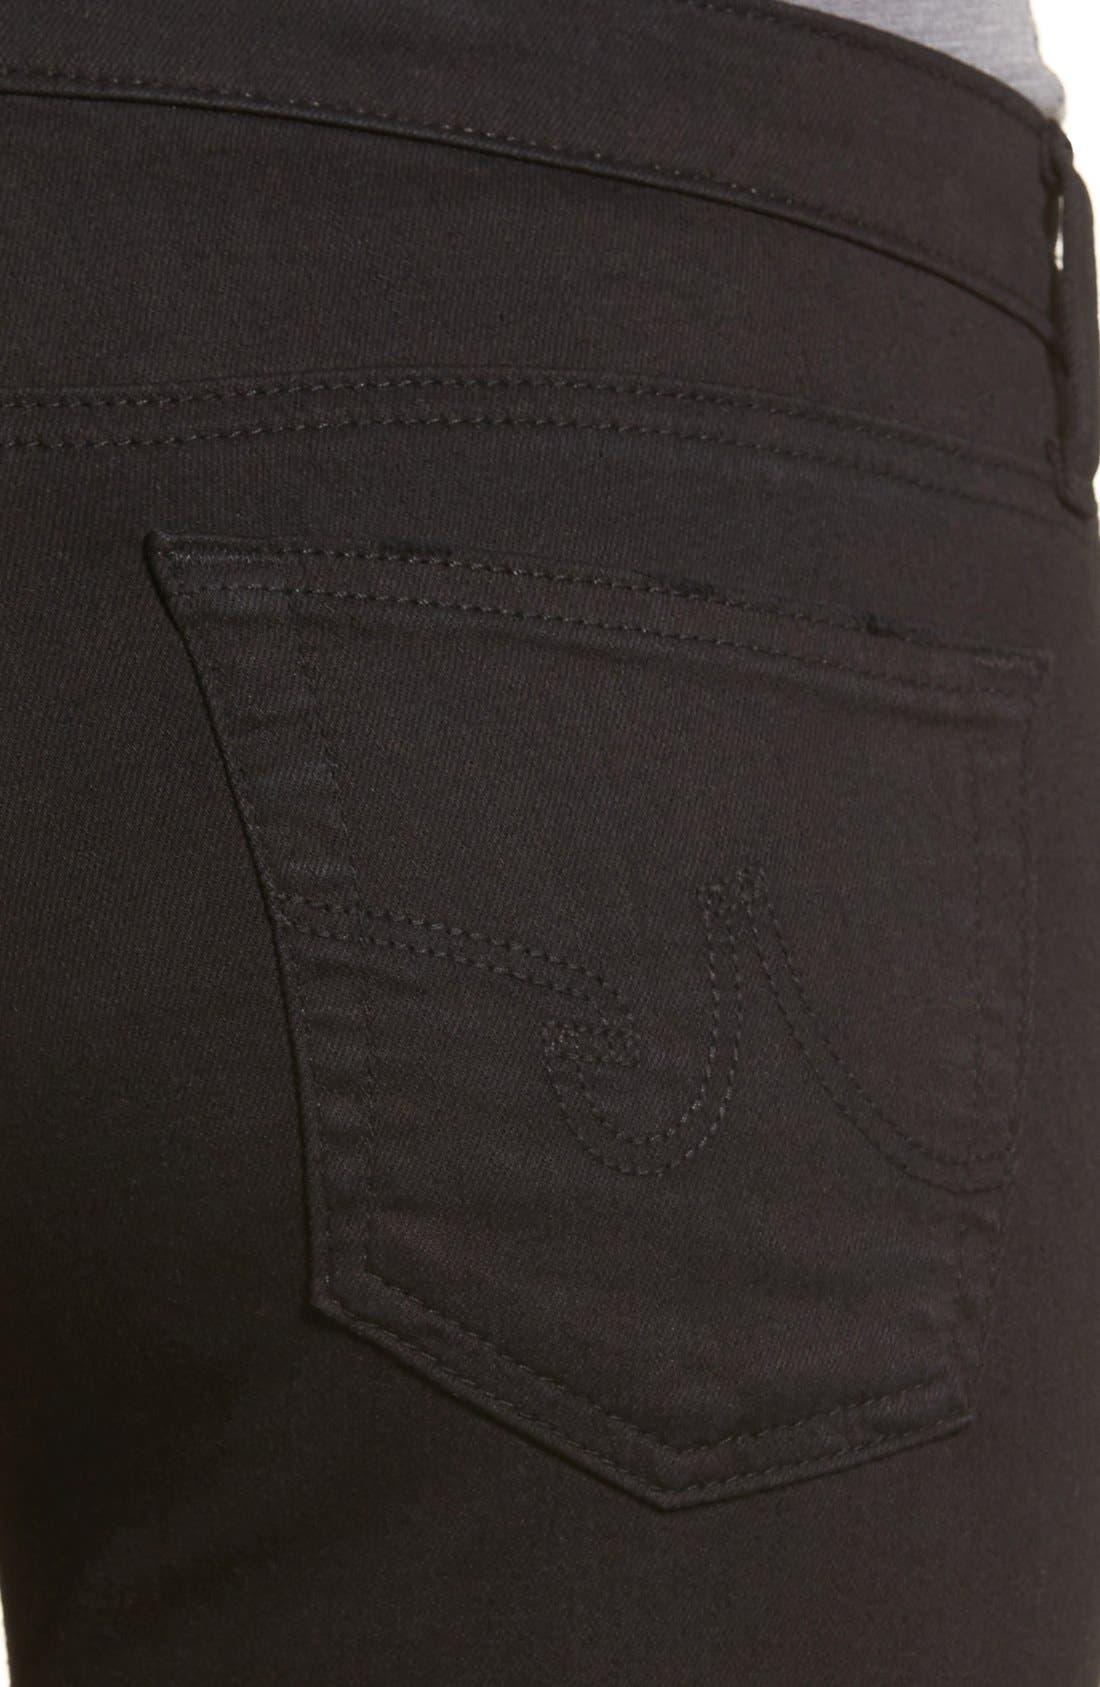 'The Legging' Ankle Super Skinny Jeans,                             Alternate thumbnail 17, color,